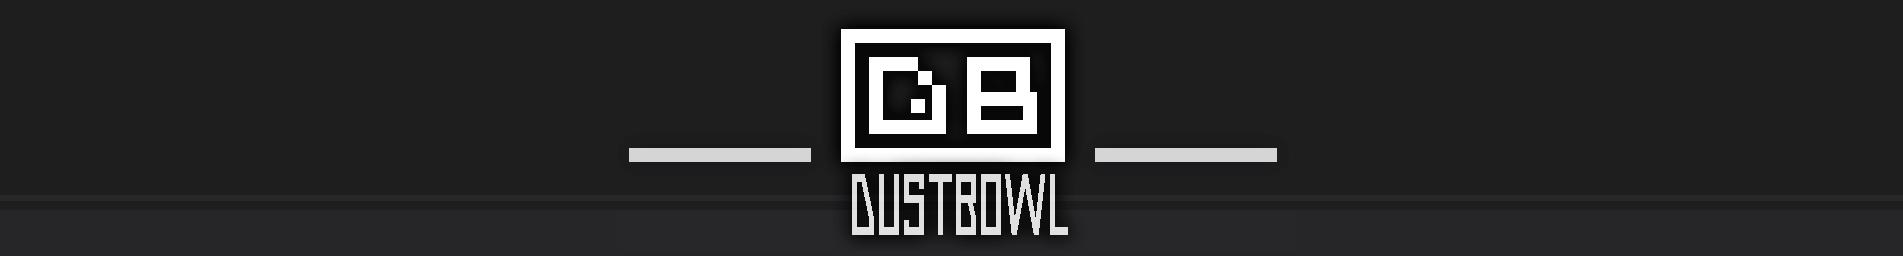 Dustbowl (free alpha demo)